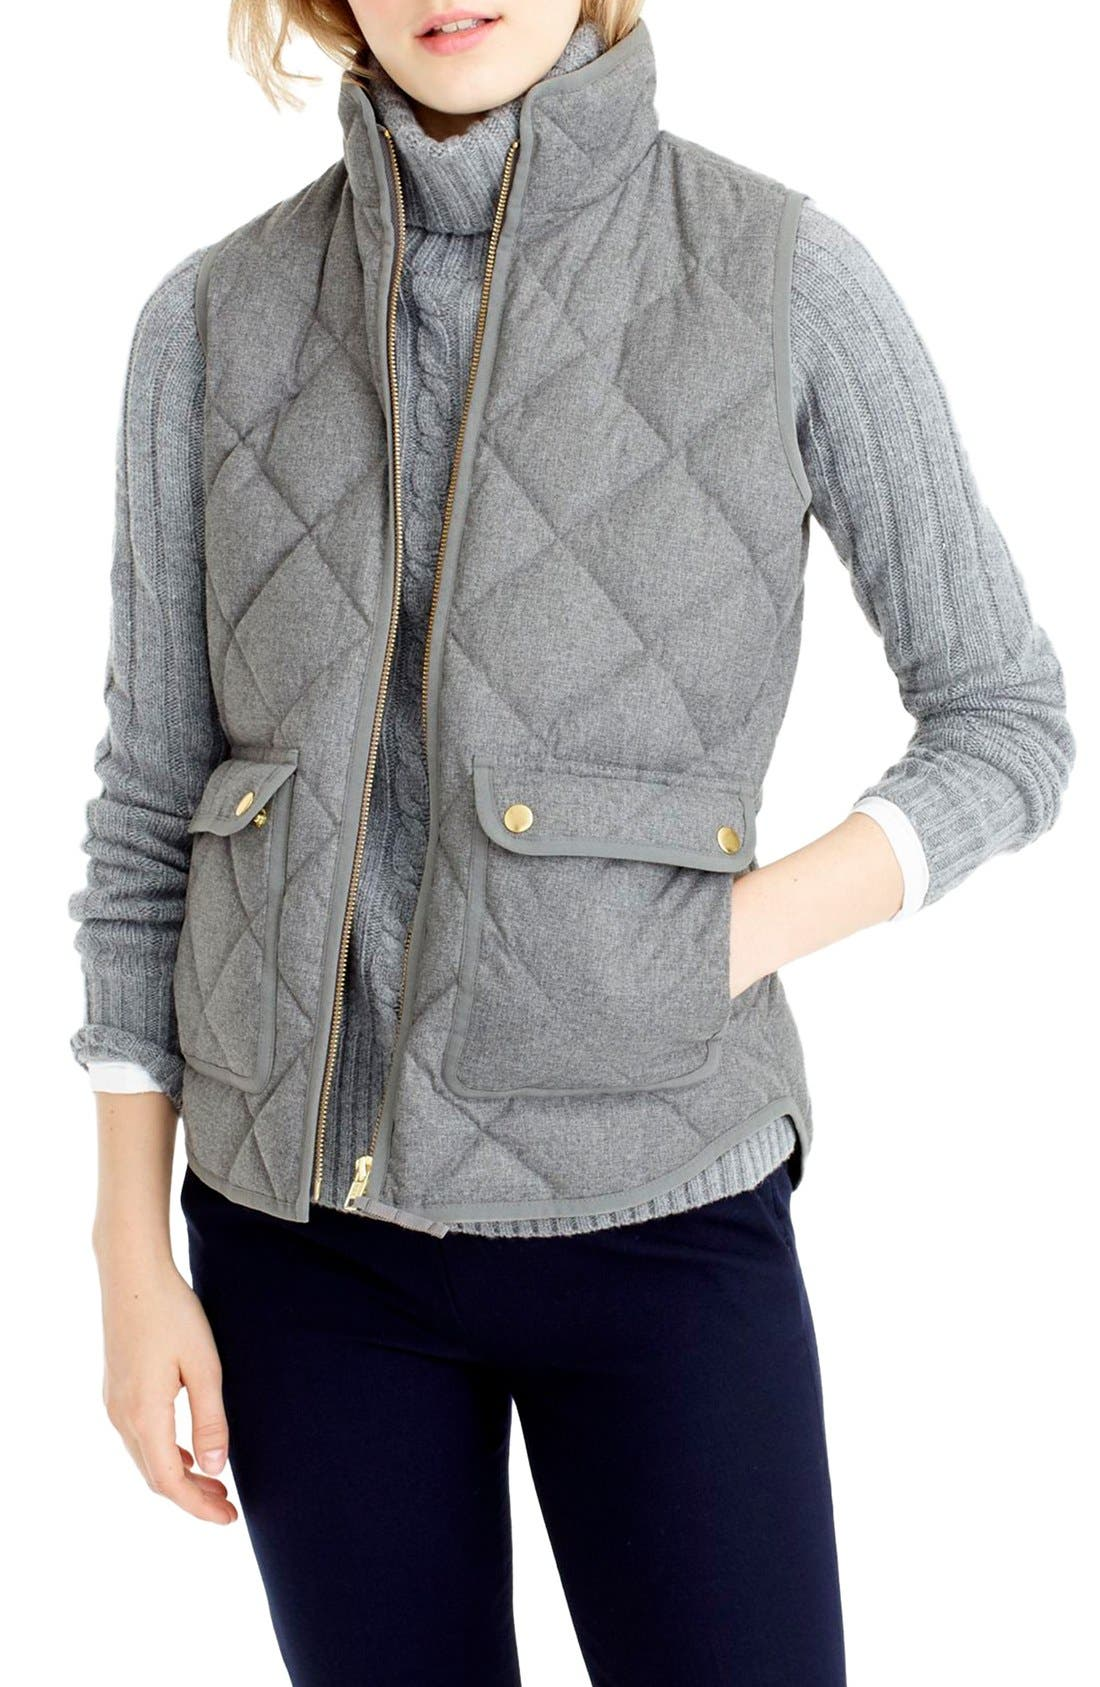 Excursion Quilted Flannel Vest,                         Main,                         color, Heather Graphite